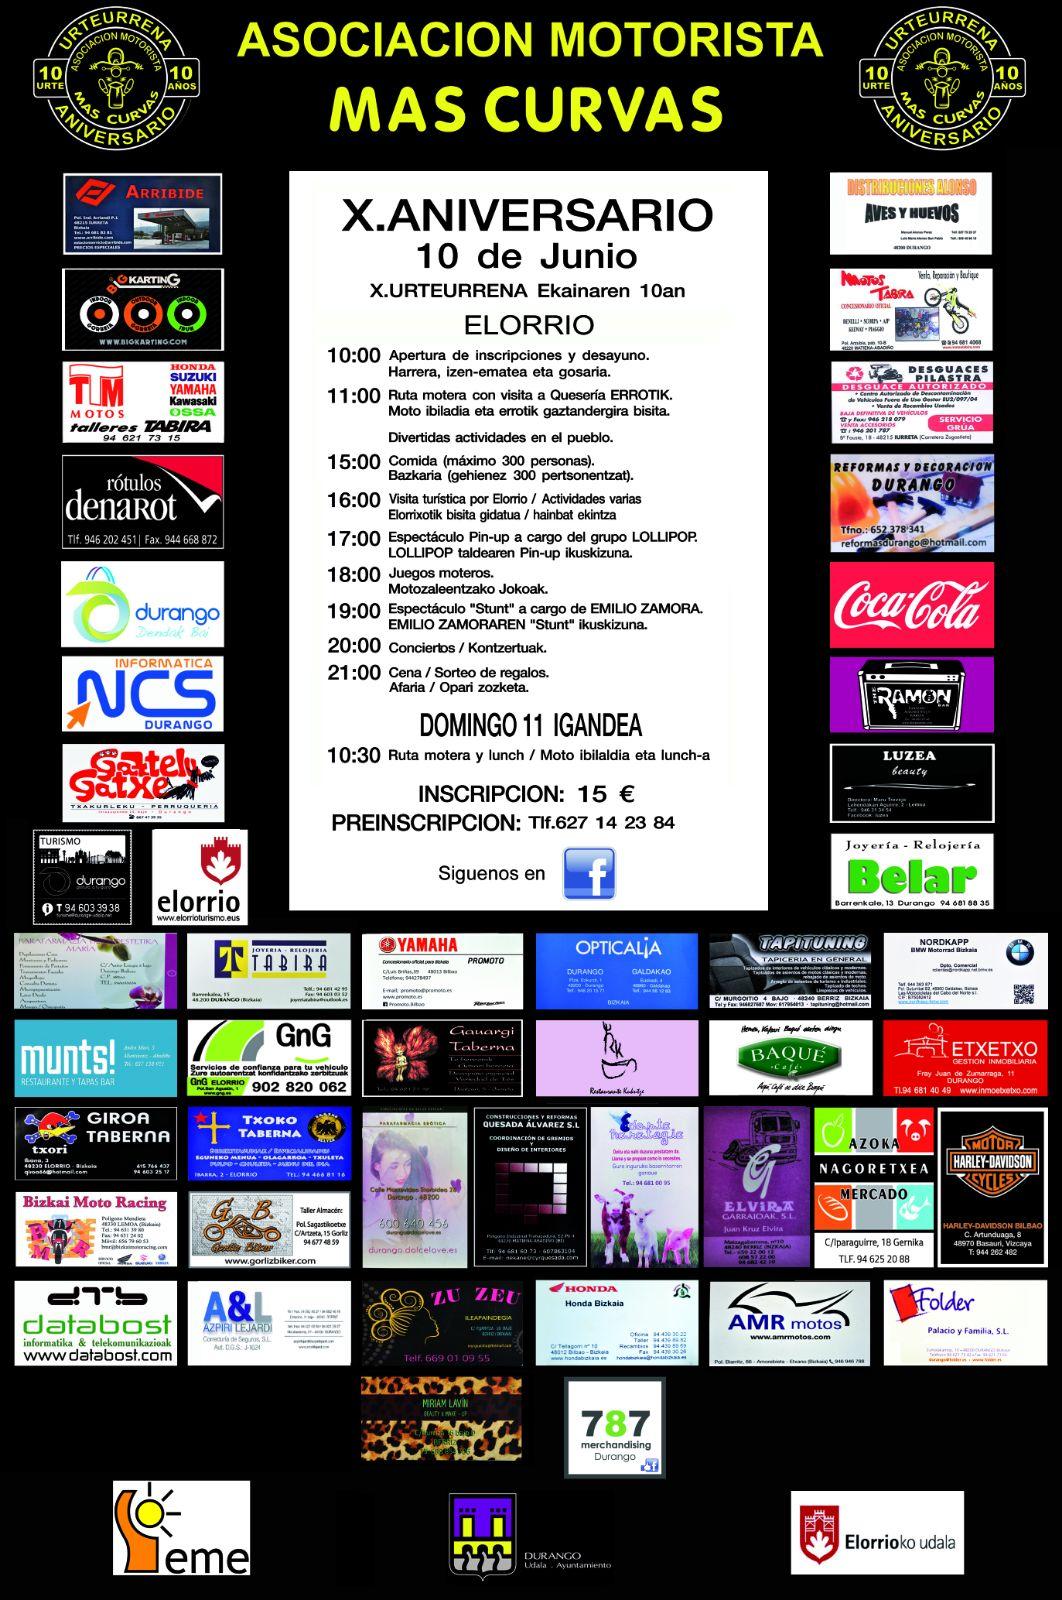 ASOCIACION MOTORISTA MAS CURVAS_CONCNETRACION_ELORRIO_BIZKAIA_EMILIO_ZAMORA_DUCATI_STUNT_SHOW_MOTOR_ESPECTACULO_VIZKAYA_2017